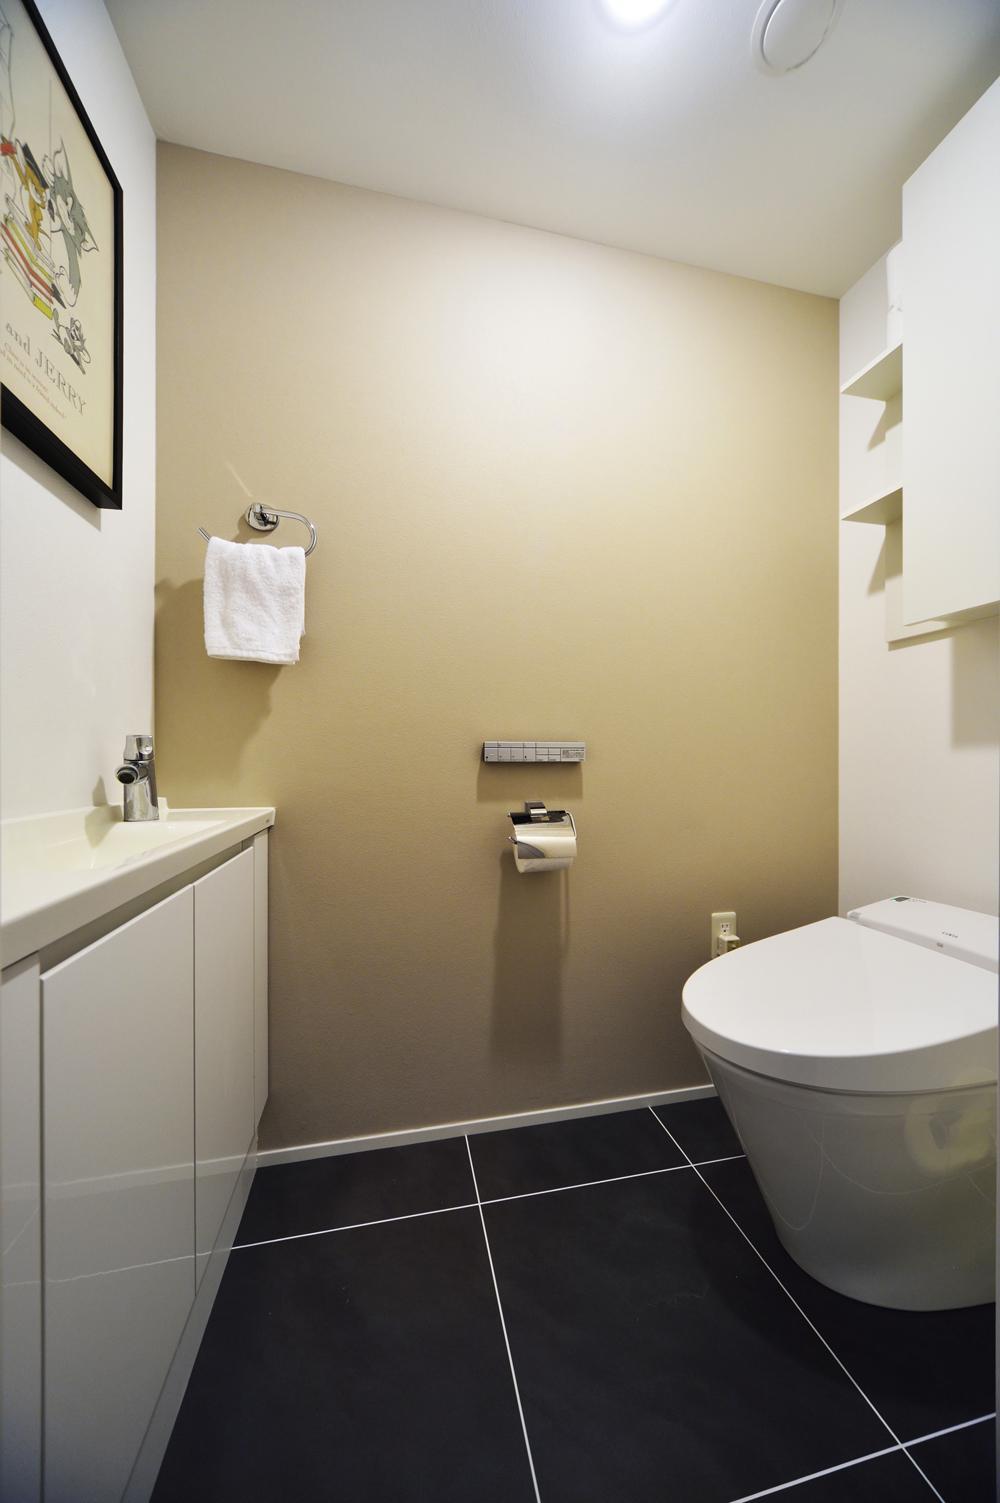 N邸・素足が気もち良い 広々リビングの写真 大判タイル張りのトイレ